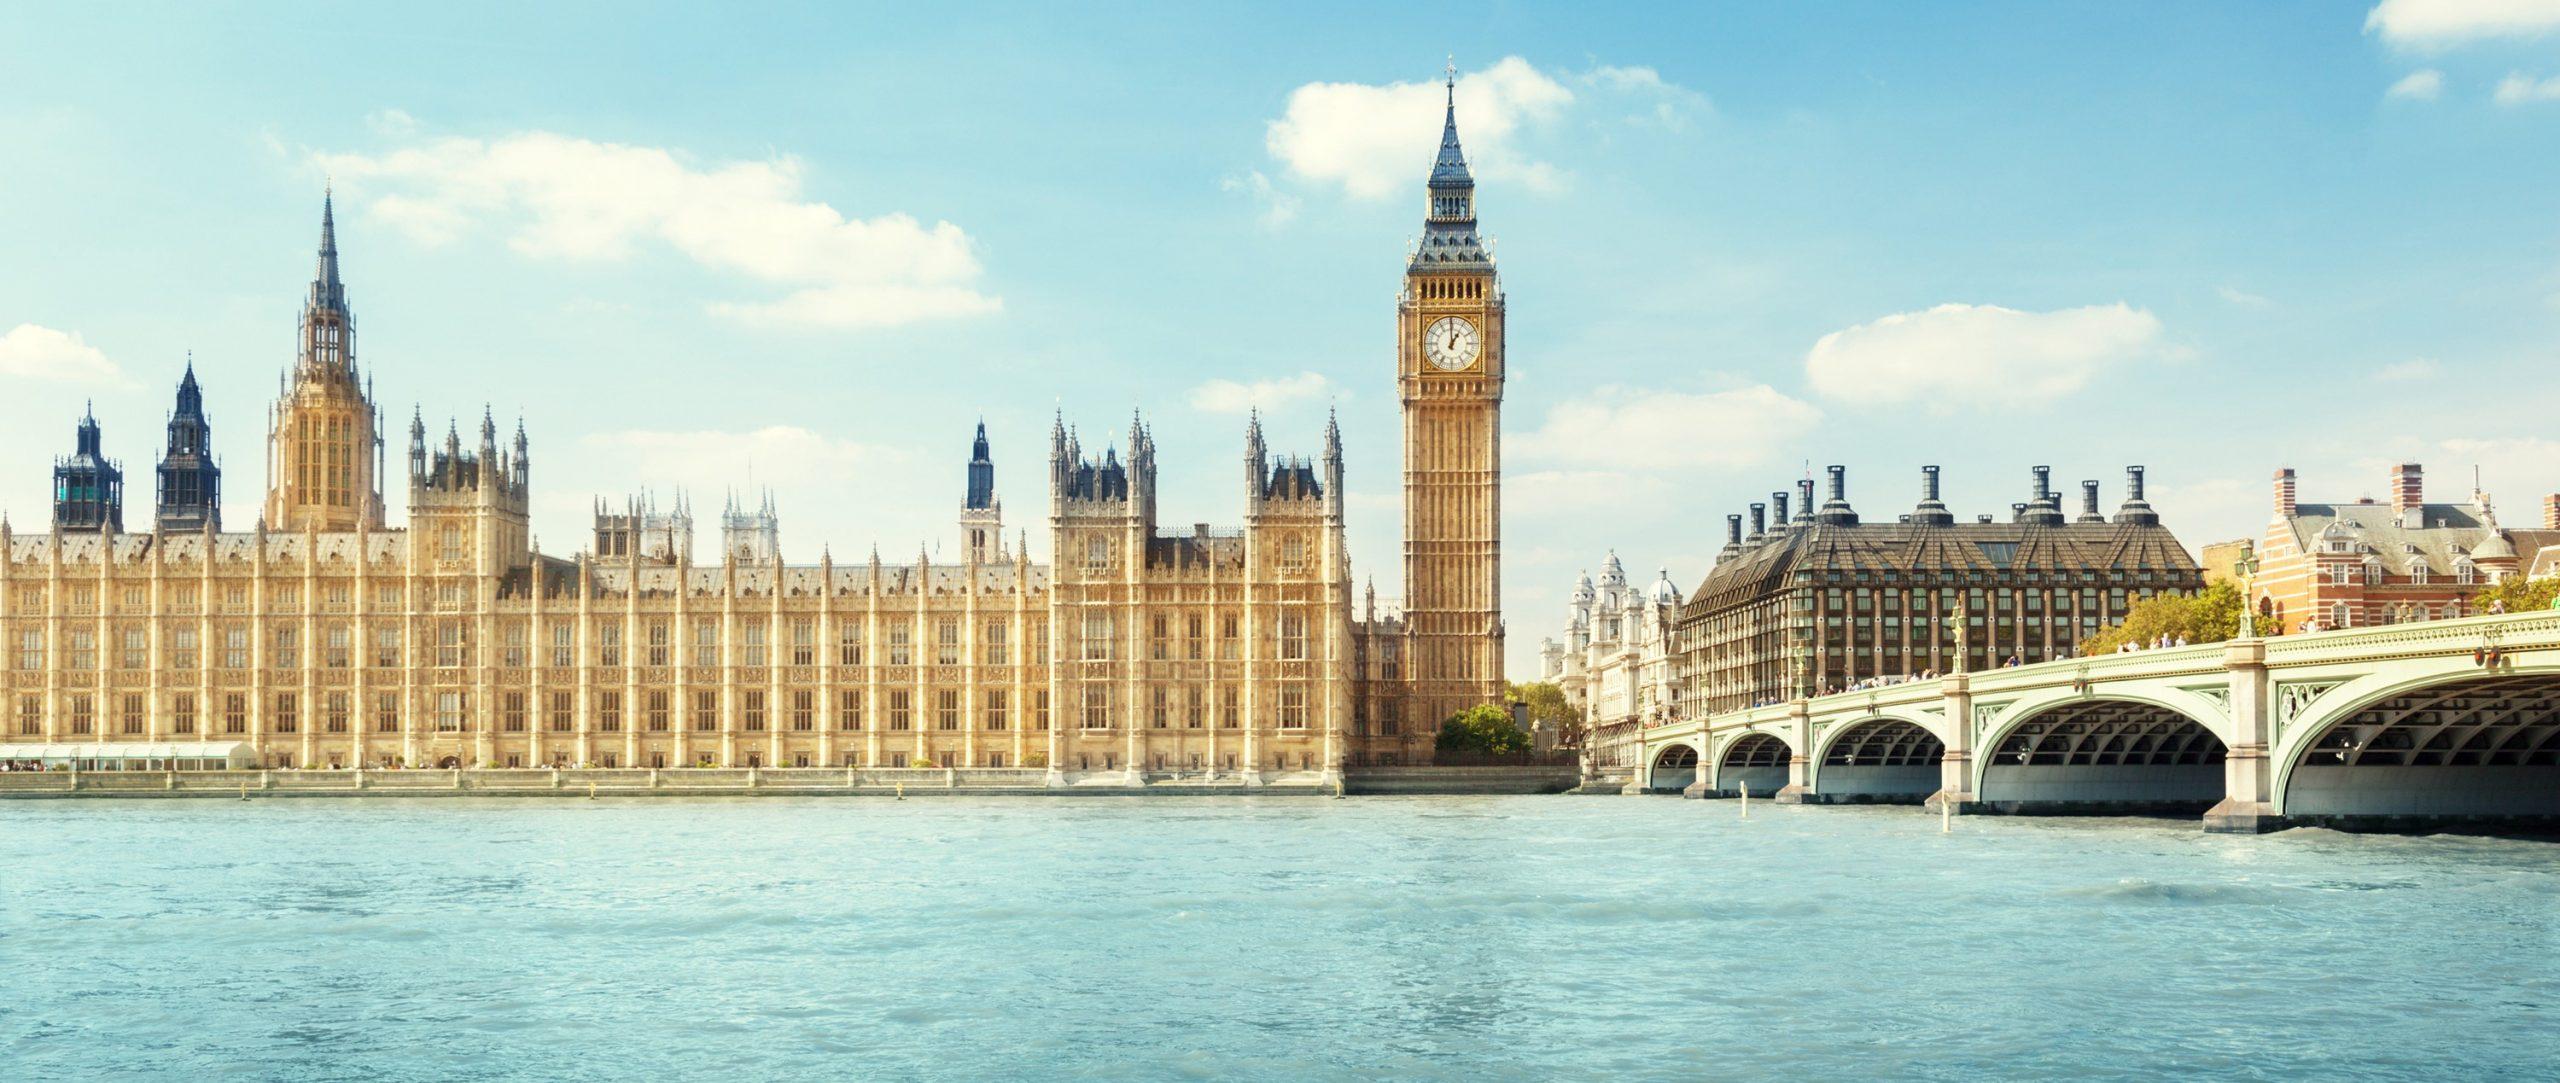 London Skyline Big Ben Auslandsmodul MIM Westminter University virtuell